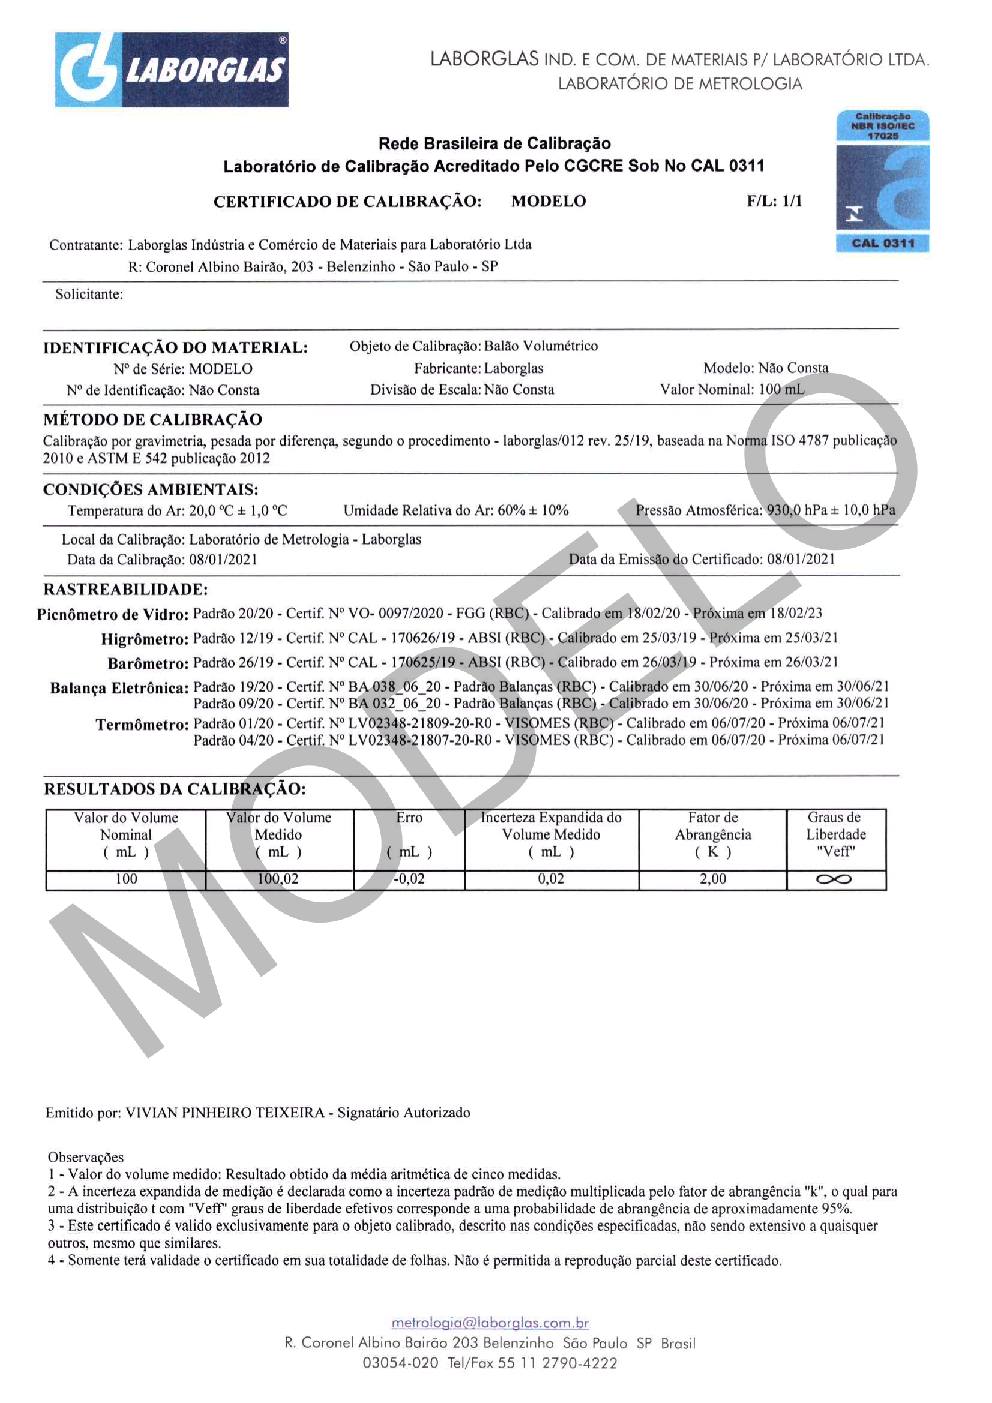 BALÃO VOLUMÉTRICO CLASSE A ROLHA POLI ÂMBAR C/ CERTIFICADO RBC 20 ML - Marca Laborglas - Cód. 91678126-R